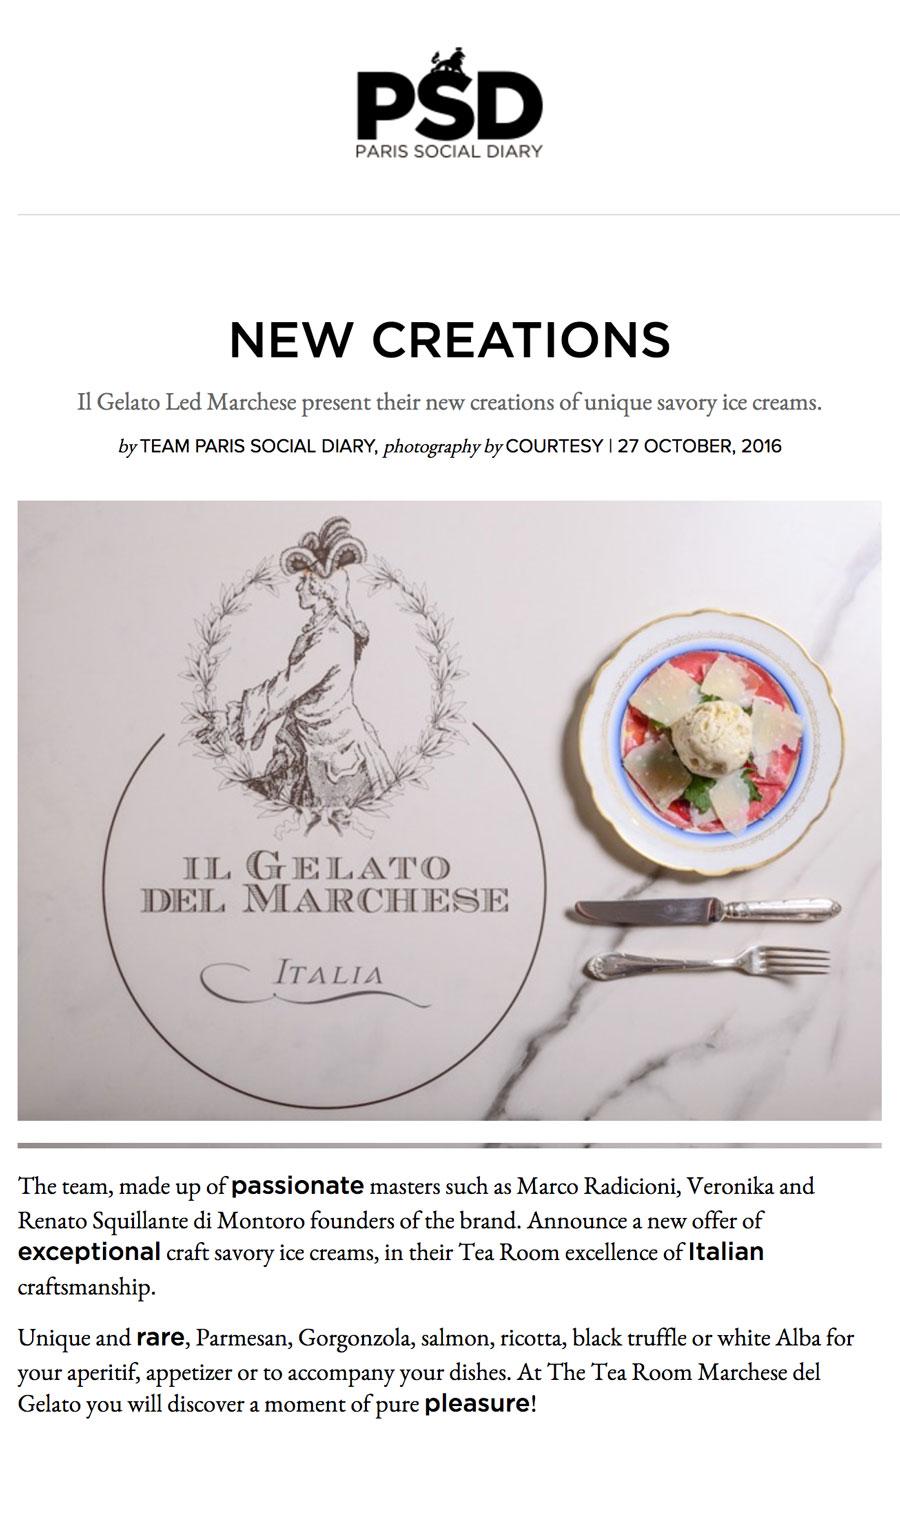 parissocialdiary-lifestyle-new-creations